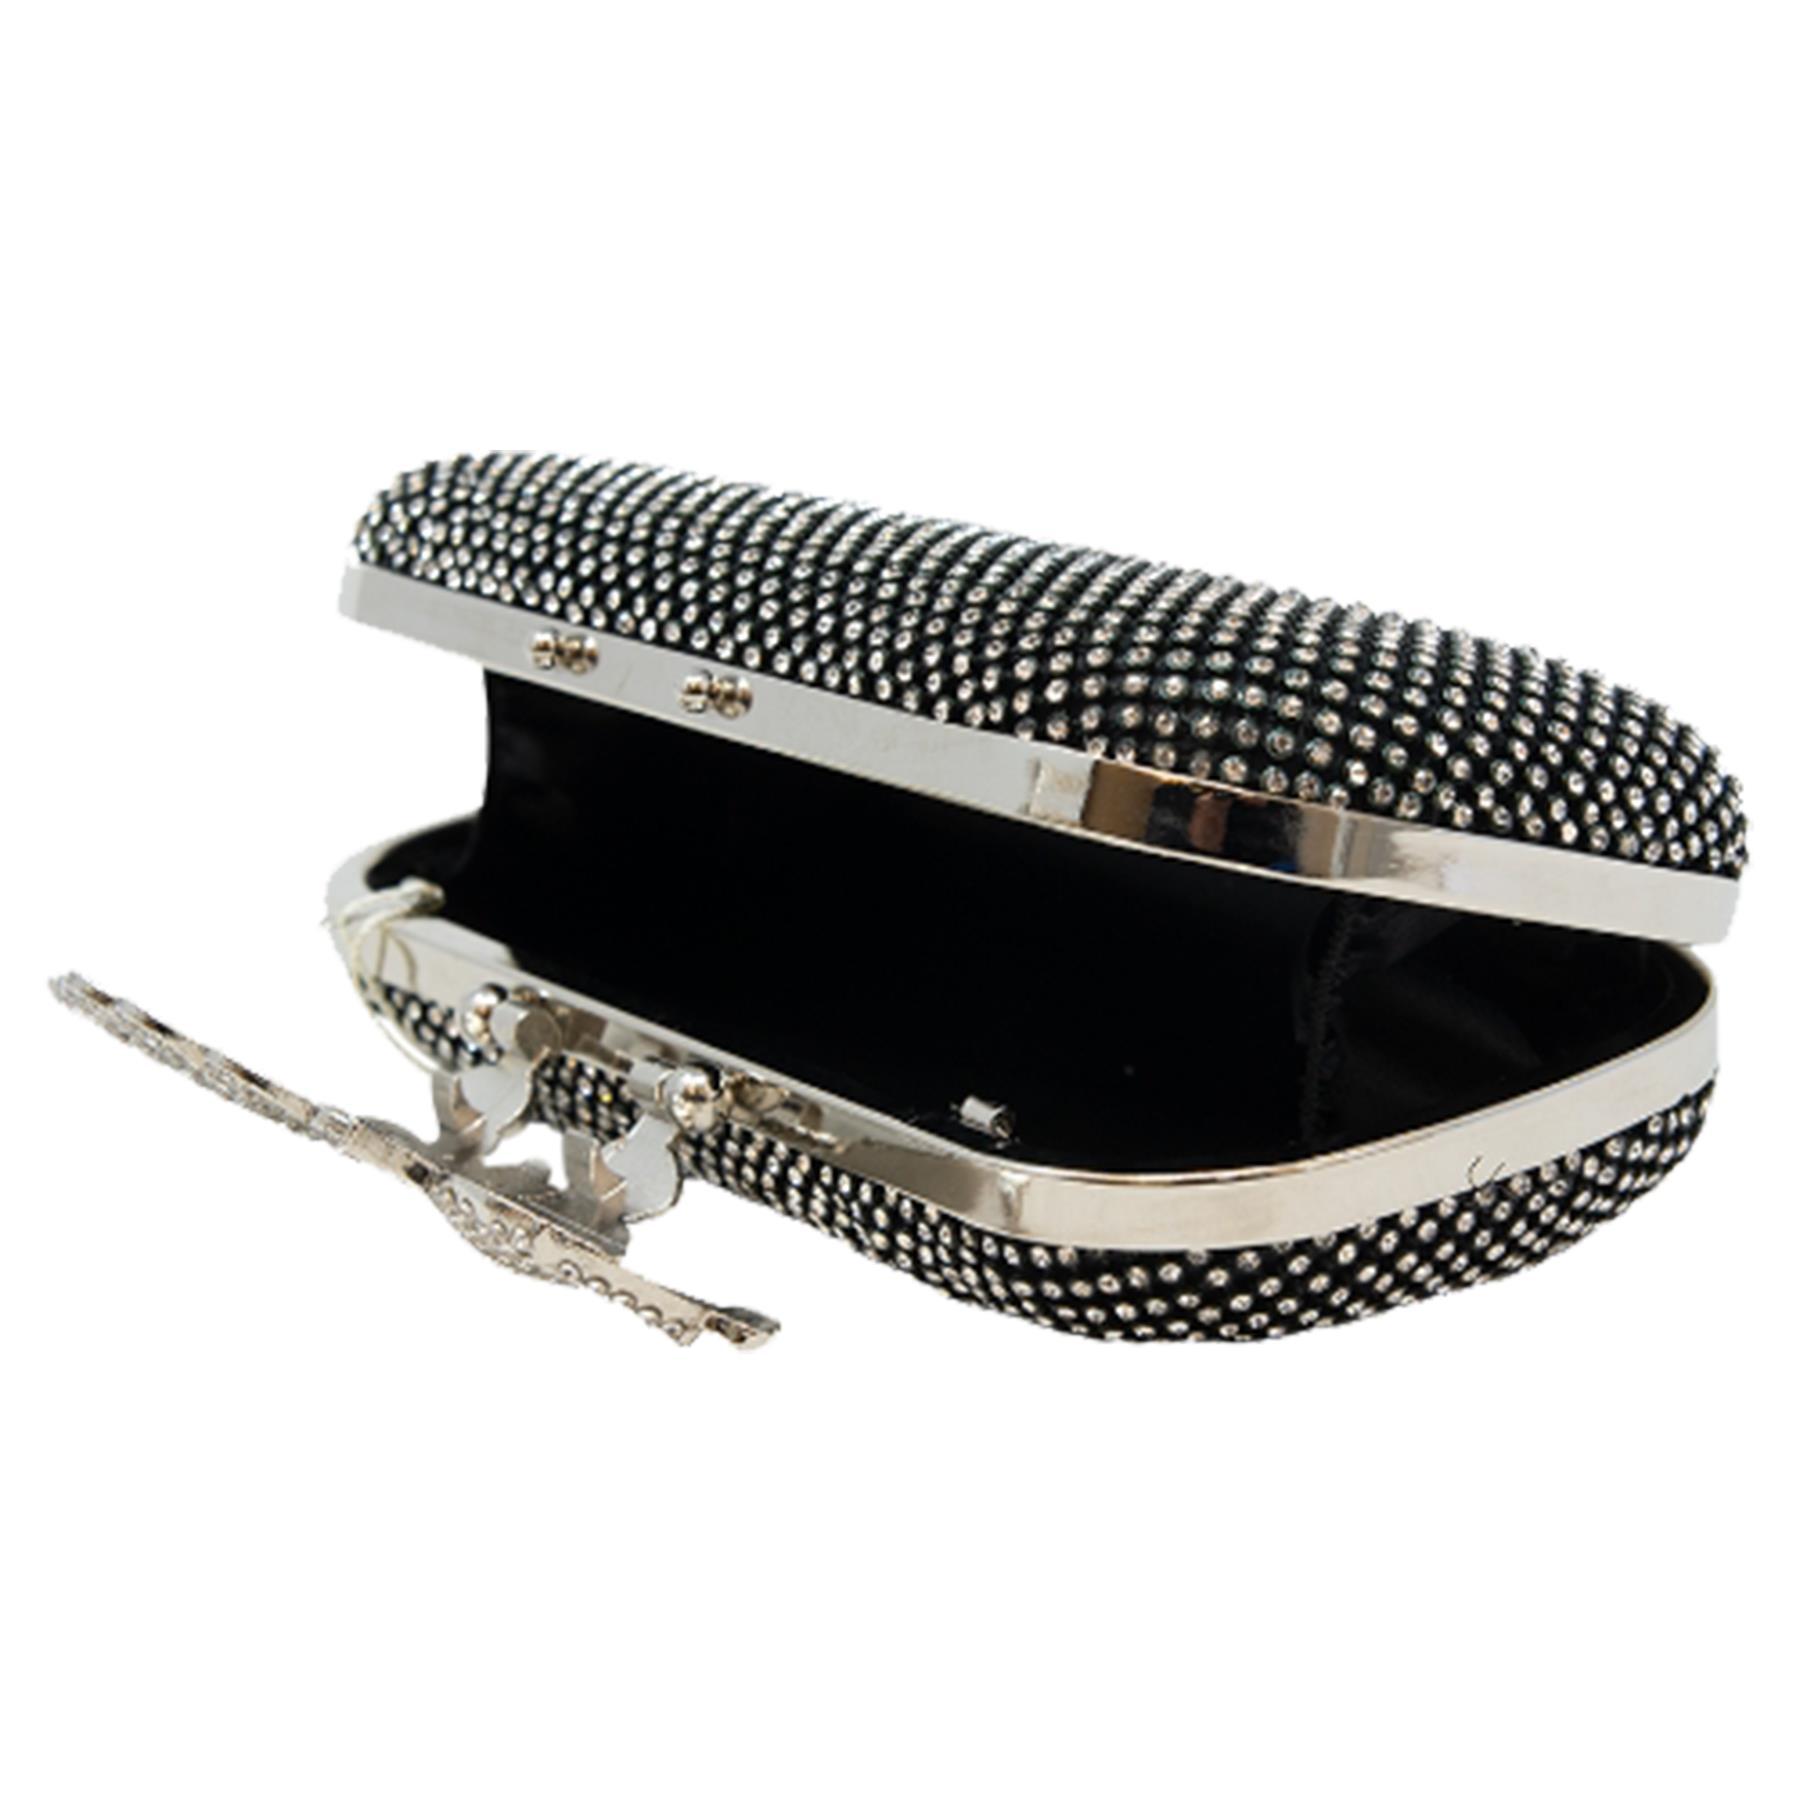 New-Women-s-Jewel-Elephant-Detail-Diamante-Chain-Box-Clutch-Bag-Purse thumbnail 4